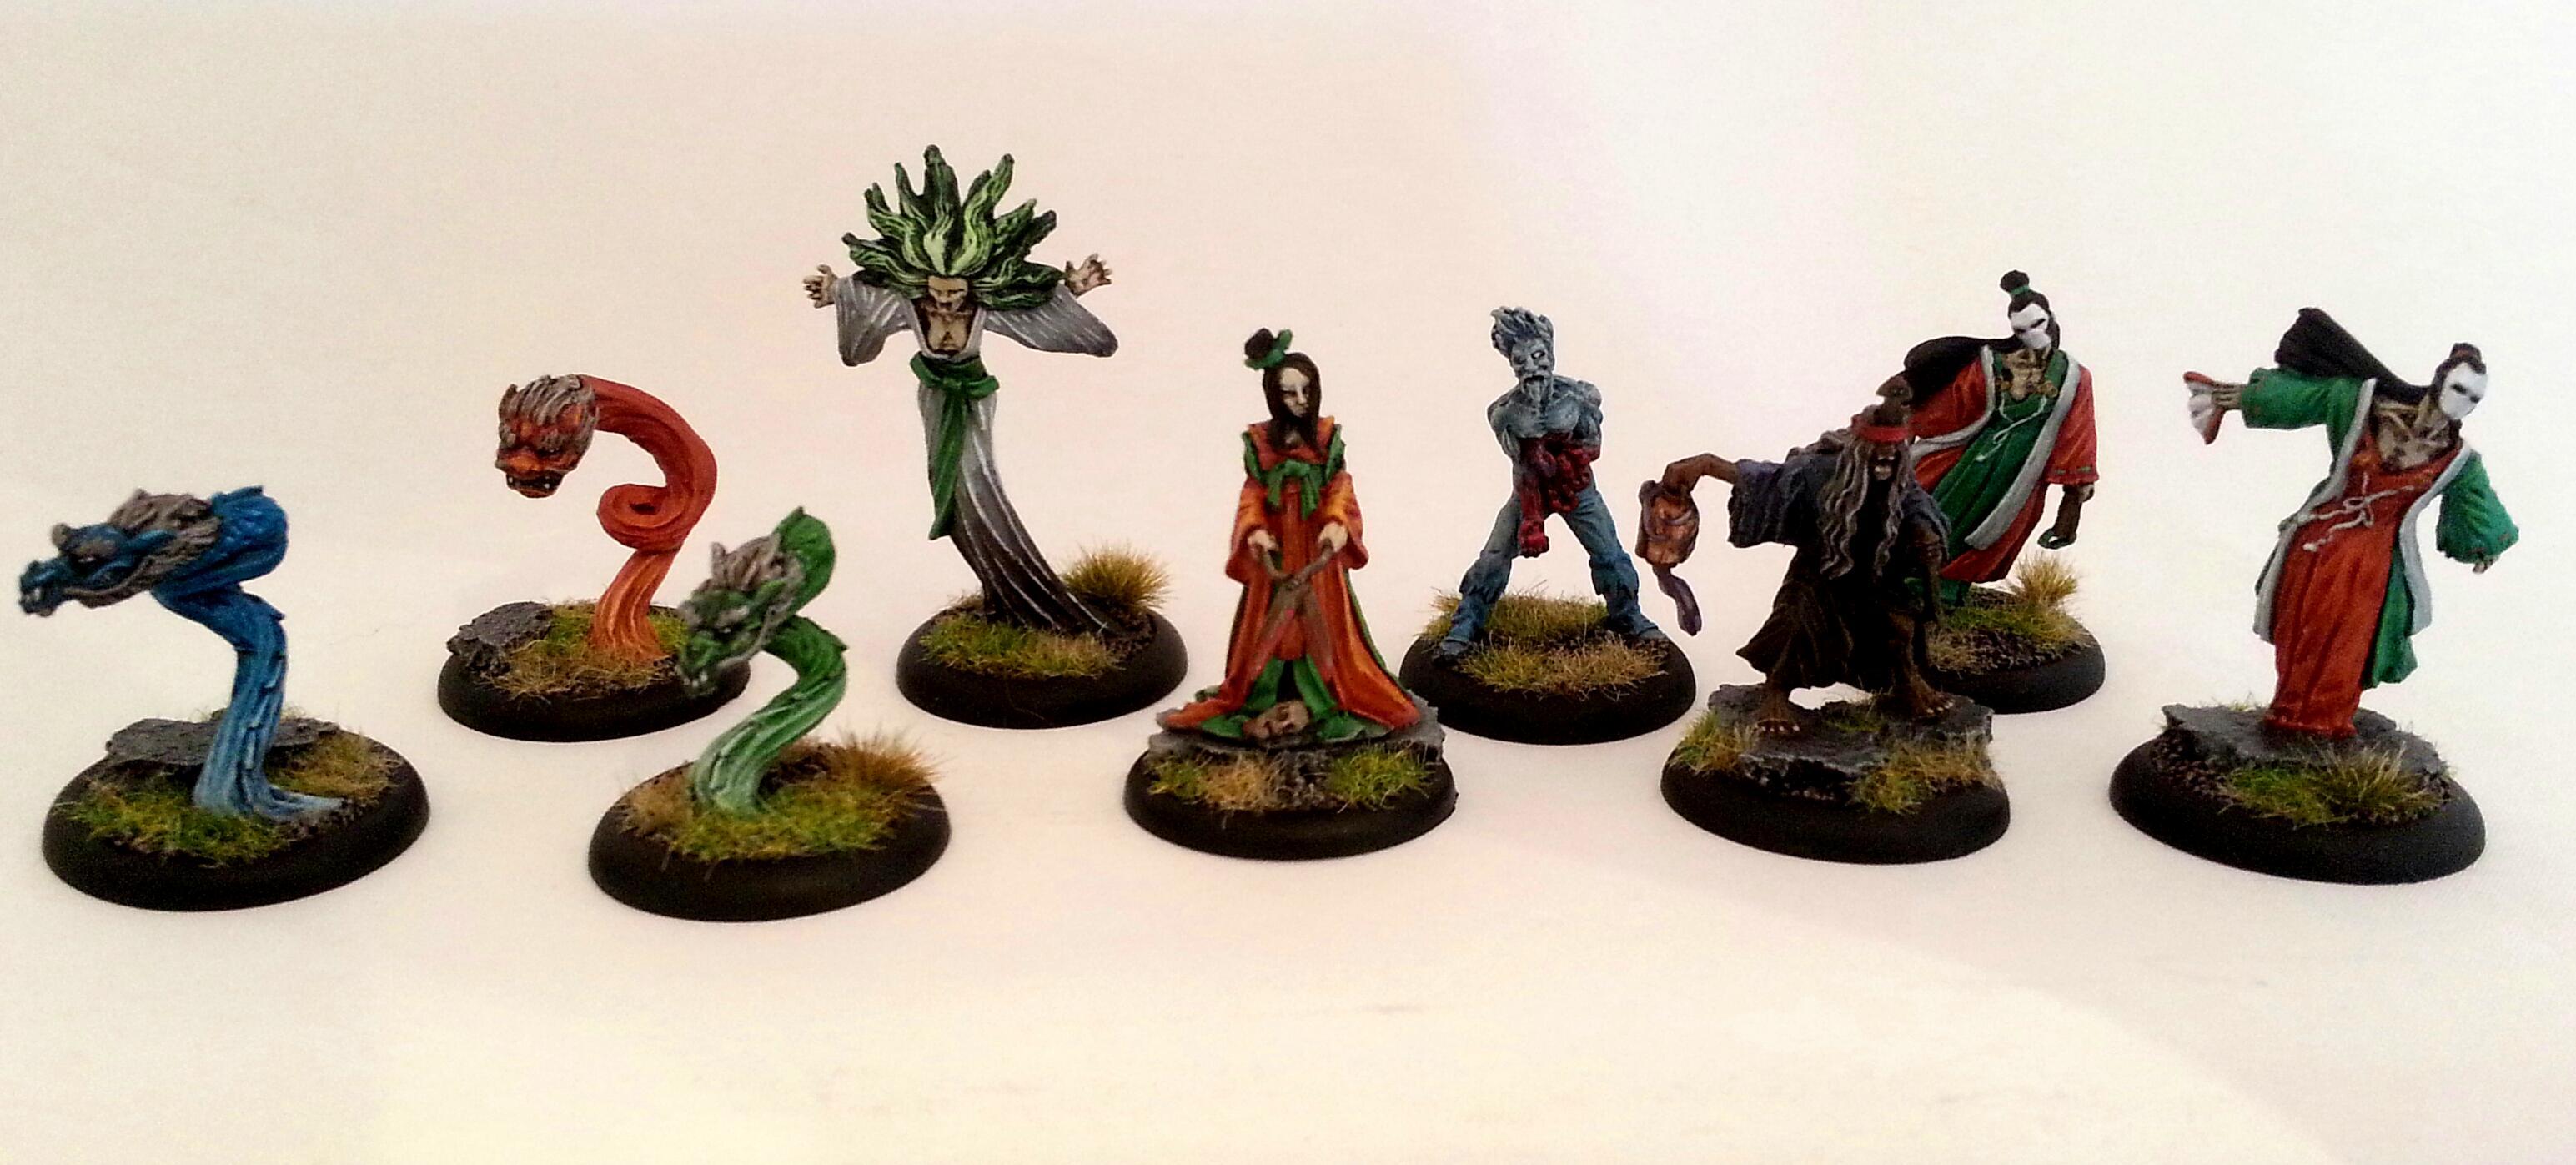 Avatar, Crew, Kirai, Malifaux, Mcmourning, Minions, Molly, Nicodem, Resurrectionists, Seamus, Spirits, Totems, Undead